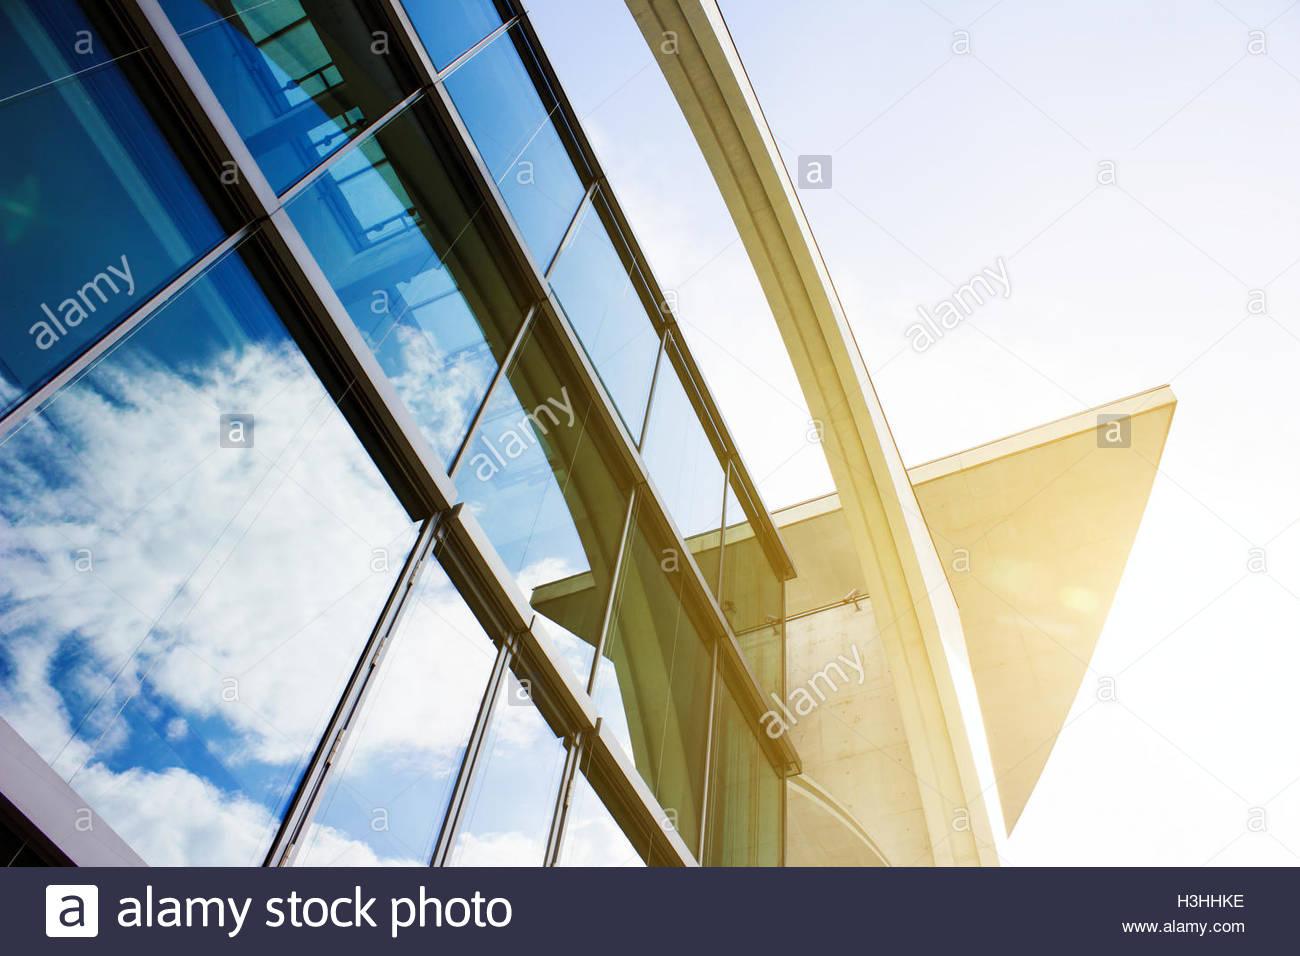 Vista exterior fachada de vidrio, futurista fondo abstracto, Arquitectura, edificio de cristal brillante abstracto Imagen De Stock